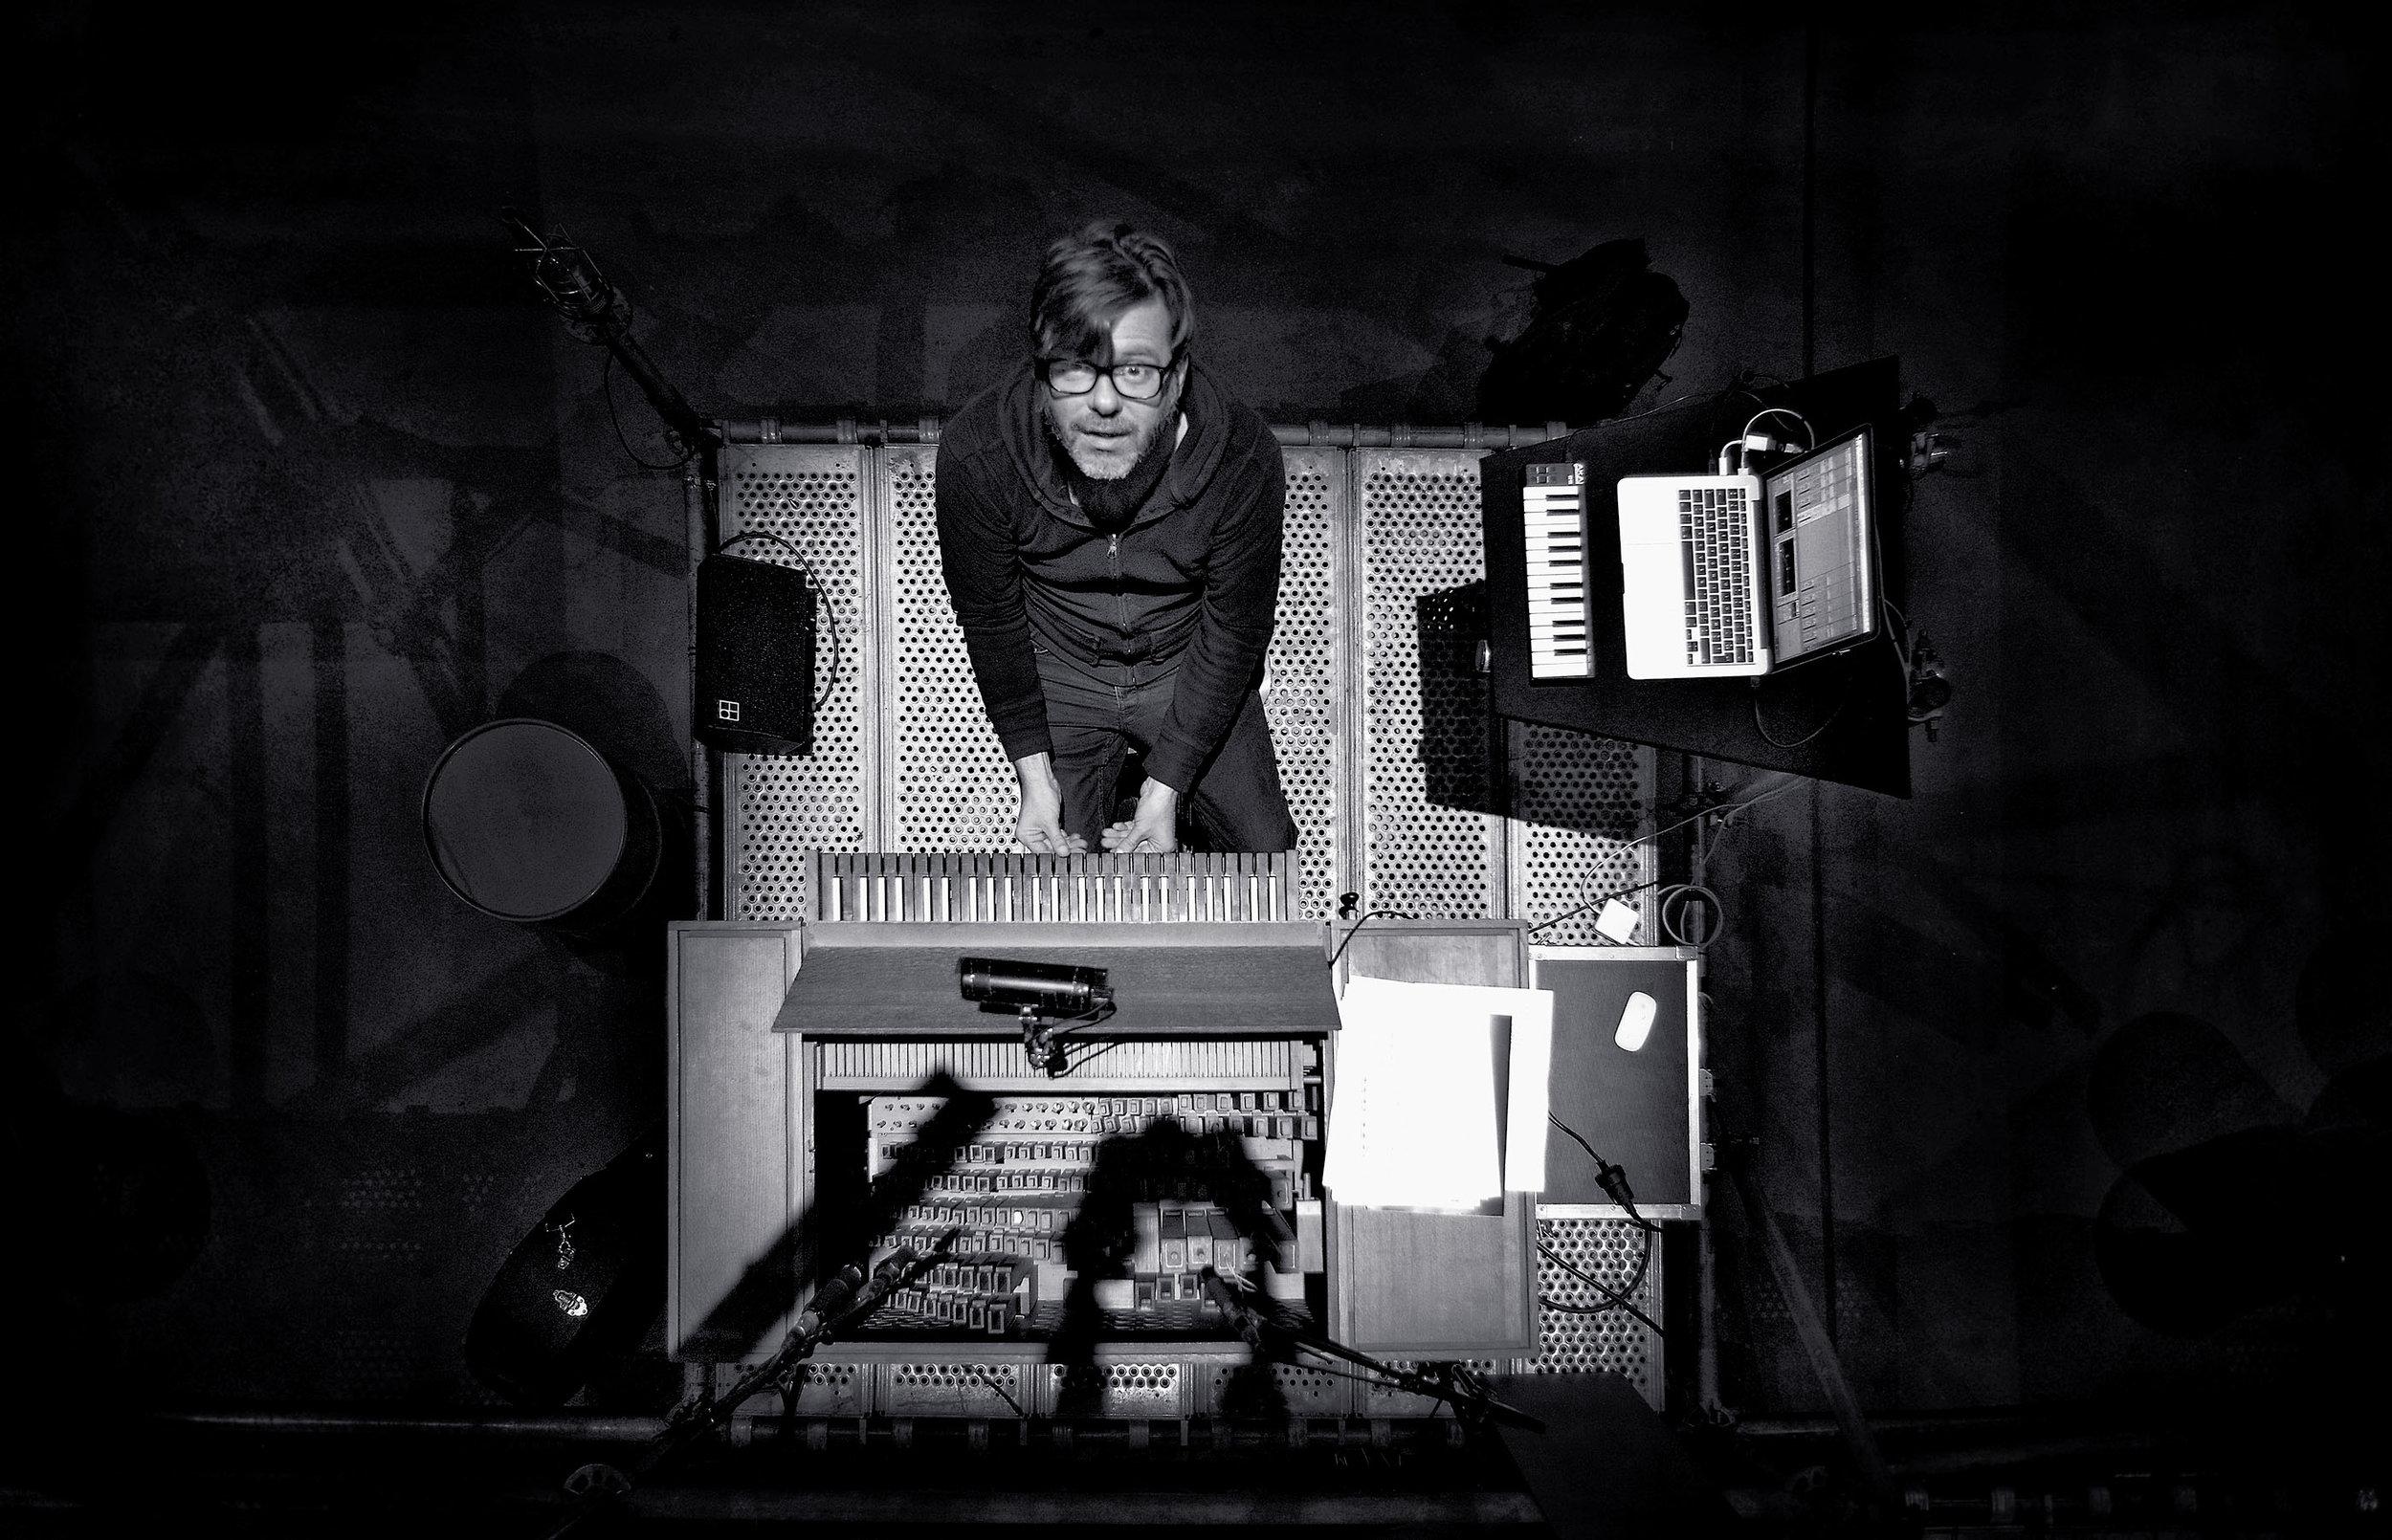 David Van Bouwel - Earth Diver